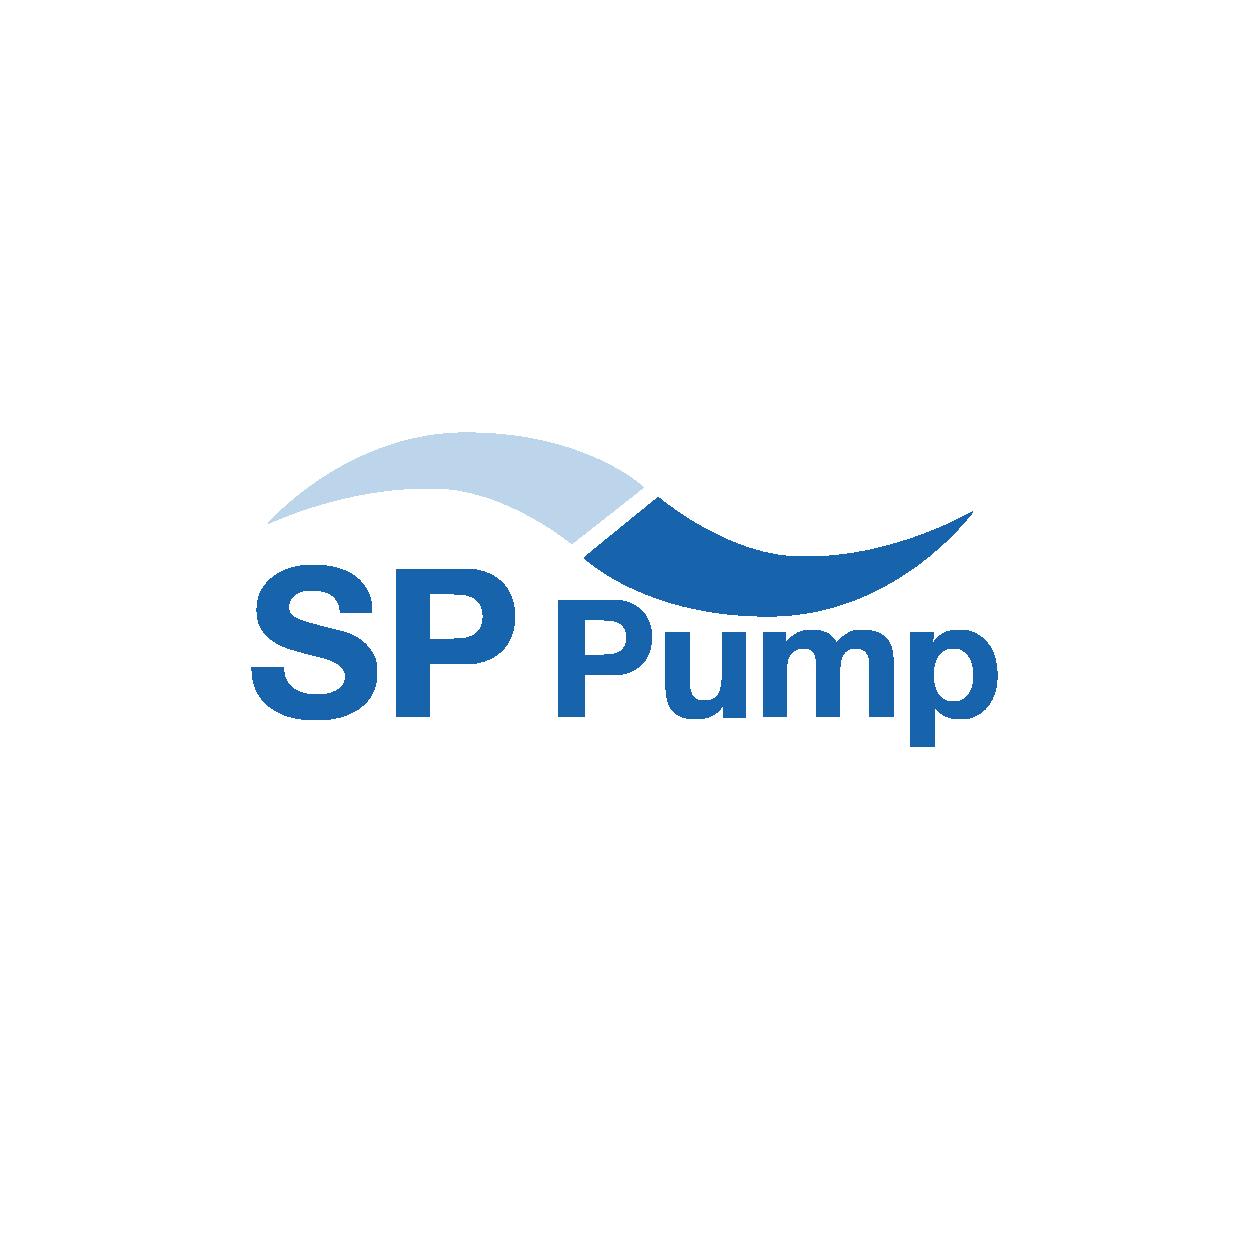 SP Pump 300px-01